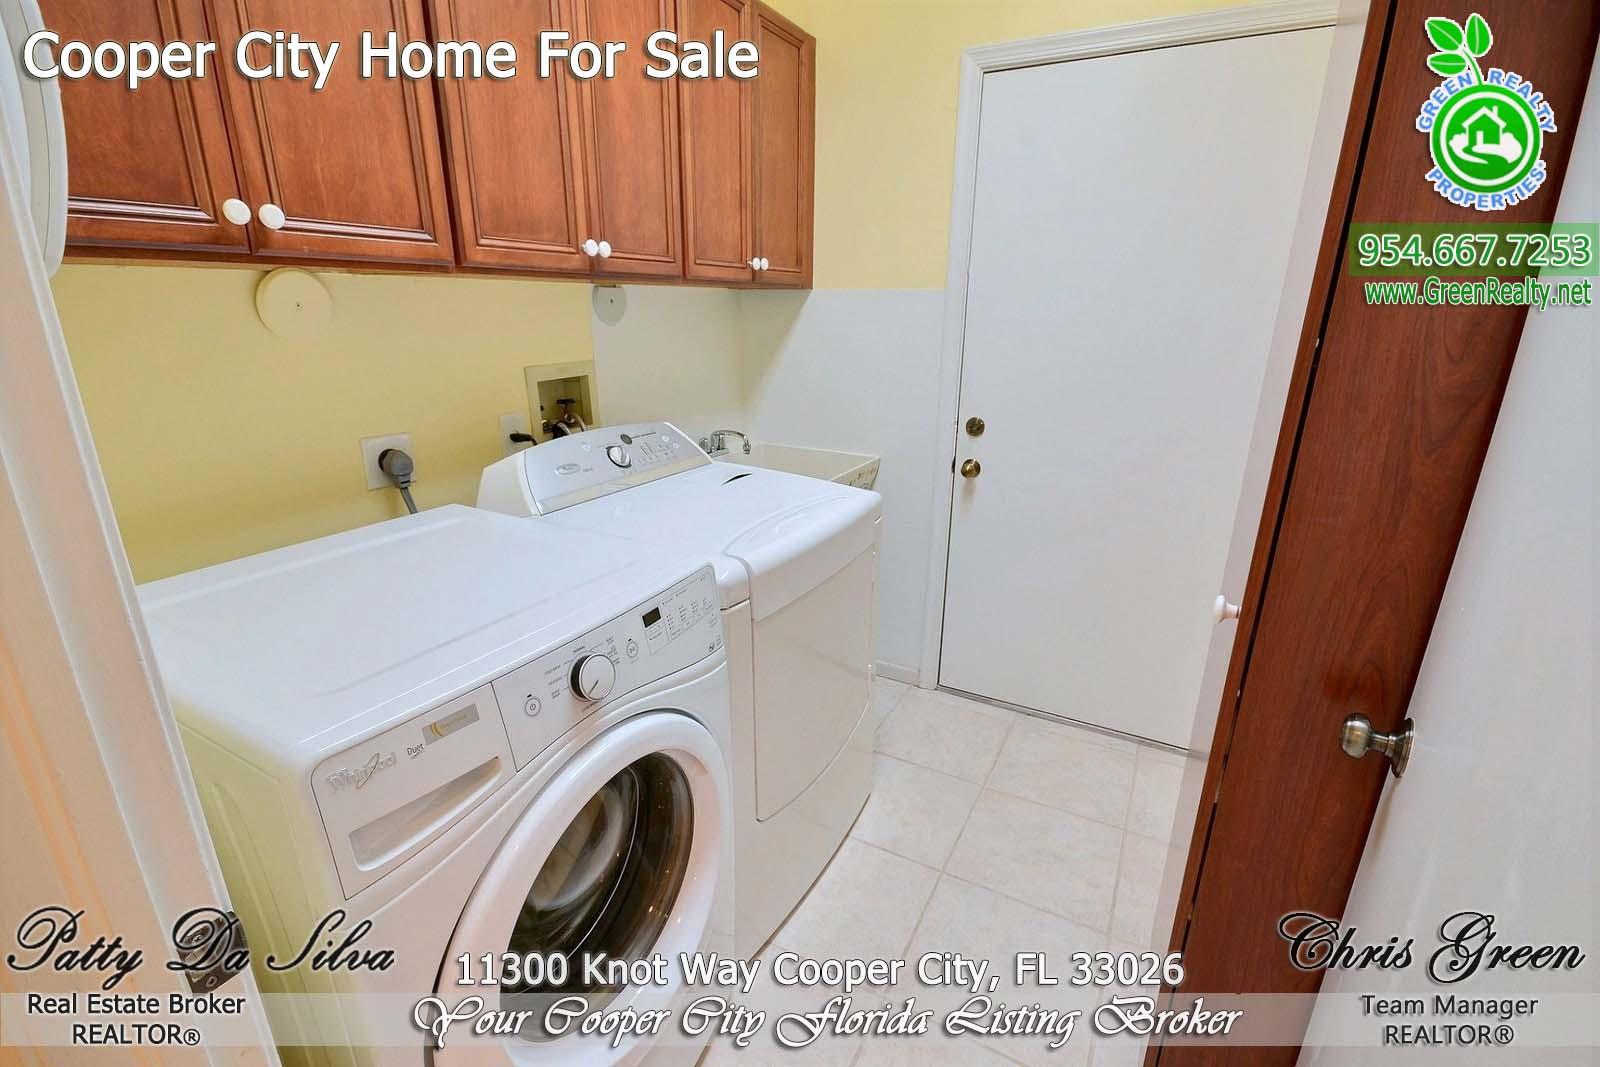 30 Cooper City Real Estate Agents (5)